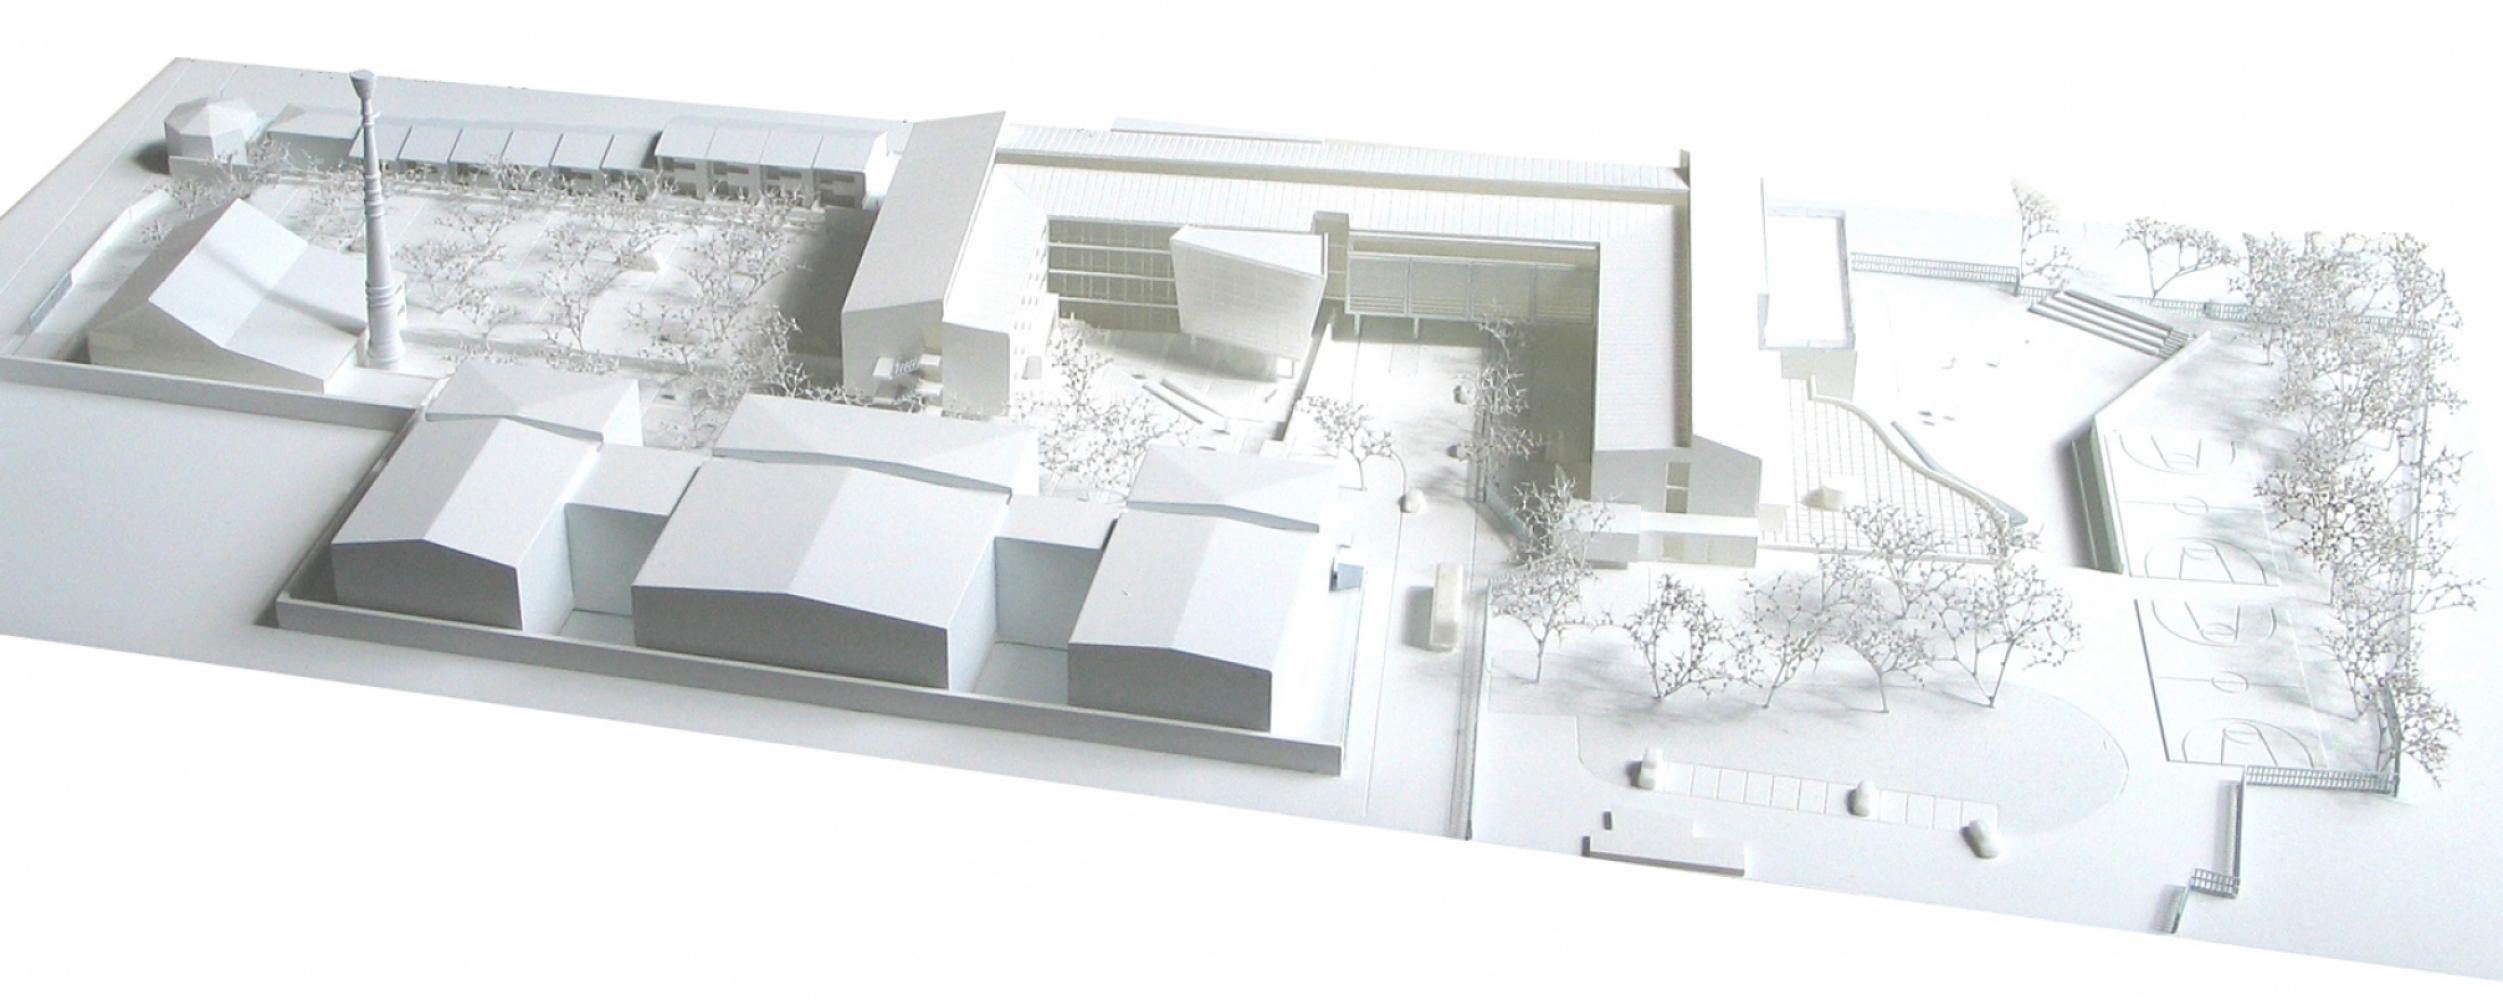 epernay02 Pascale SEURIN Architecte - Pascale SEURIN Architecte